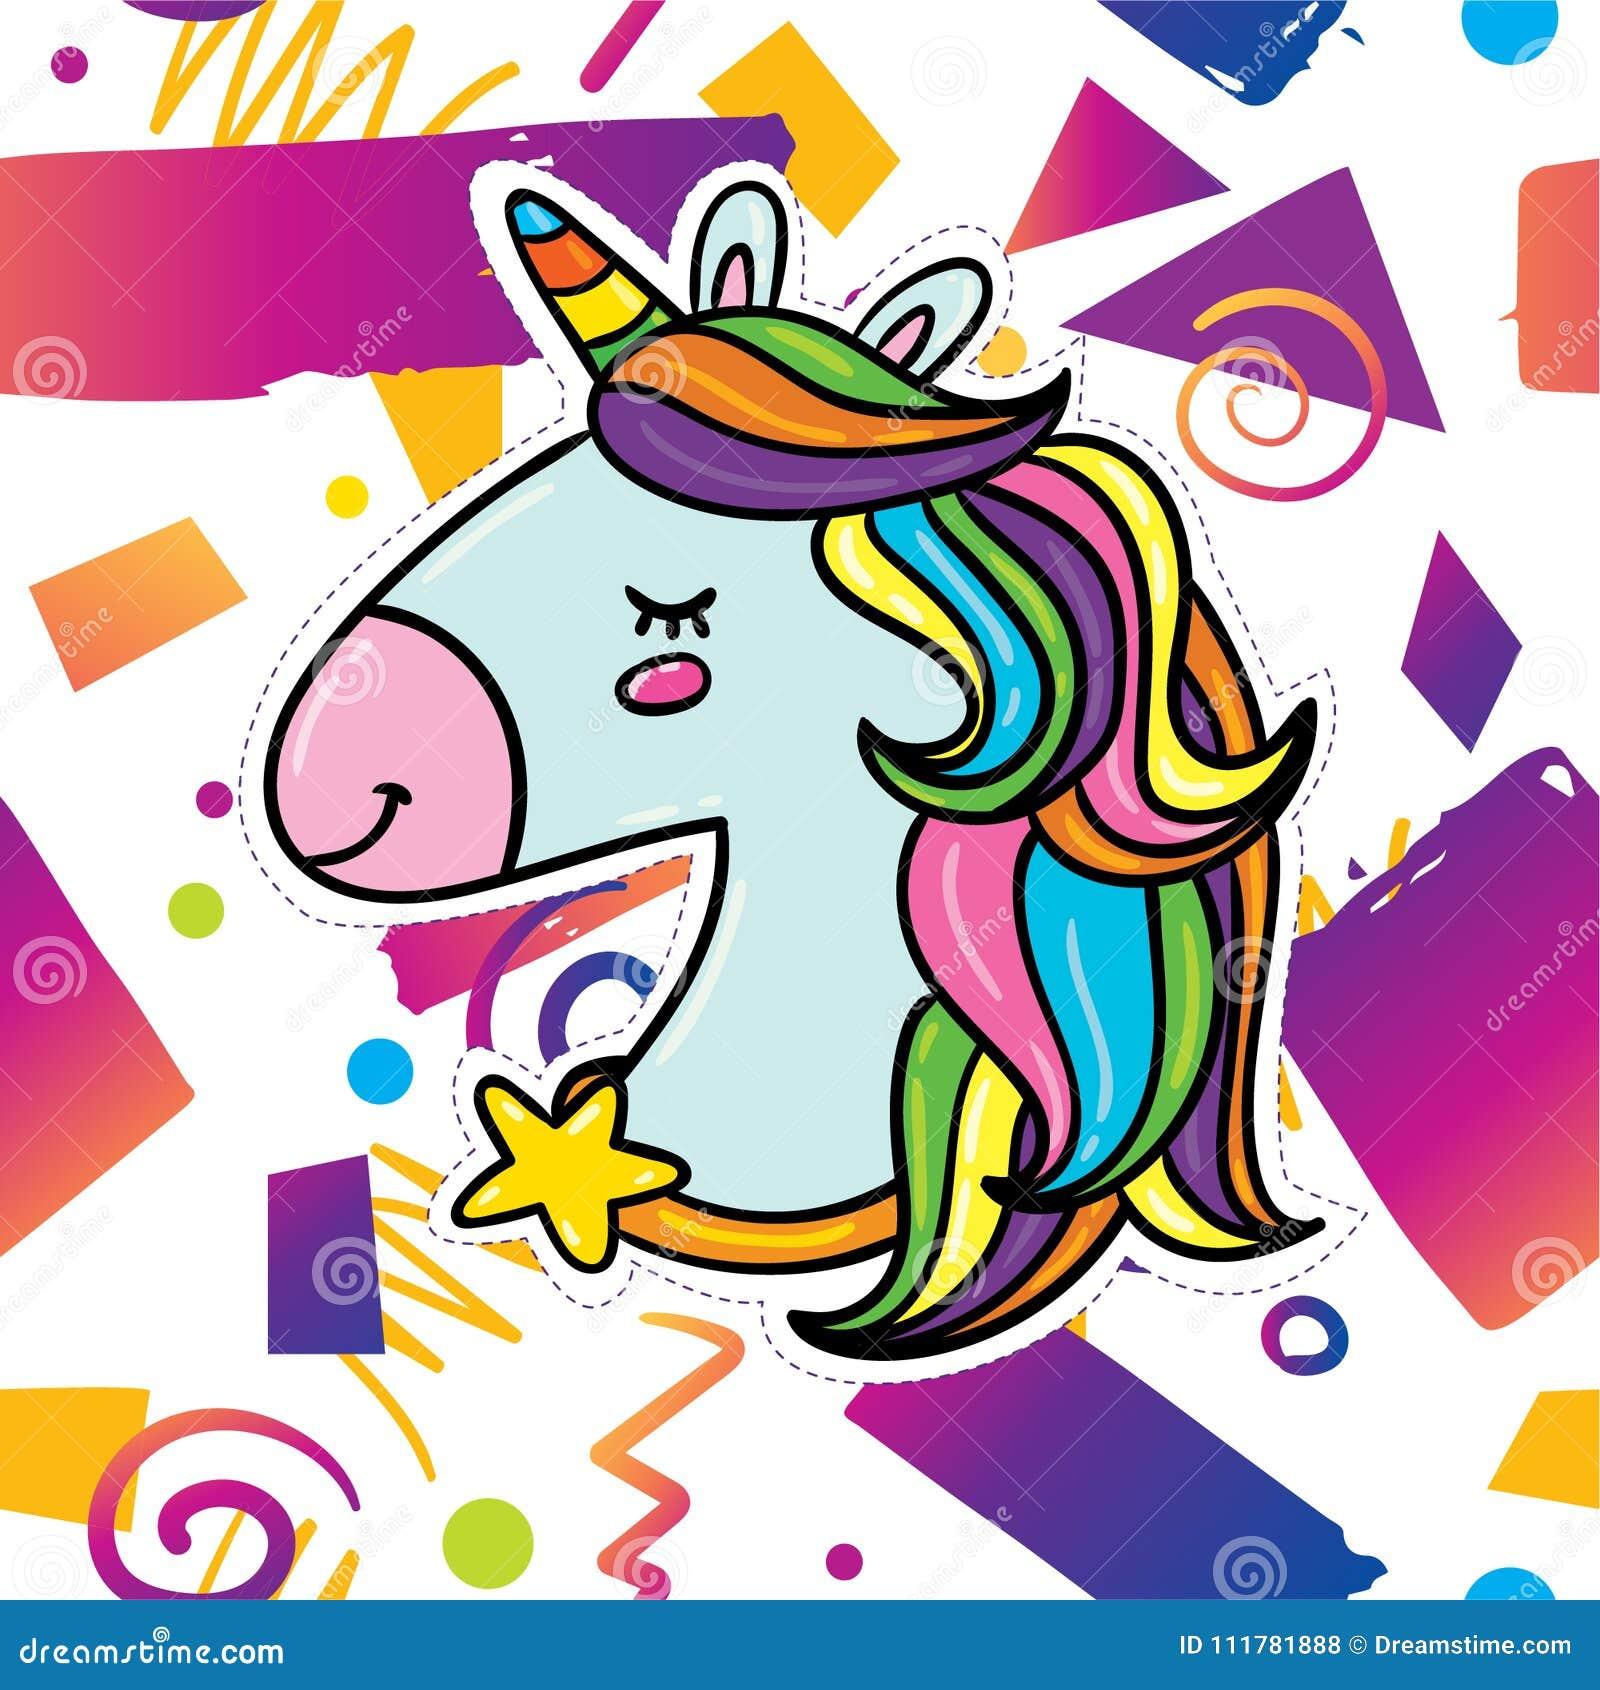 Trendy card design with unicorn